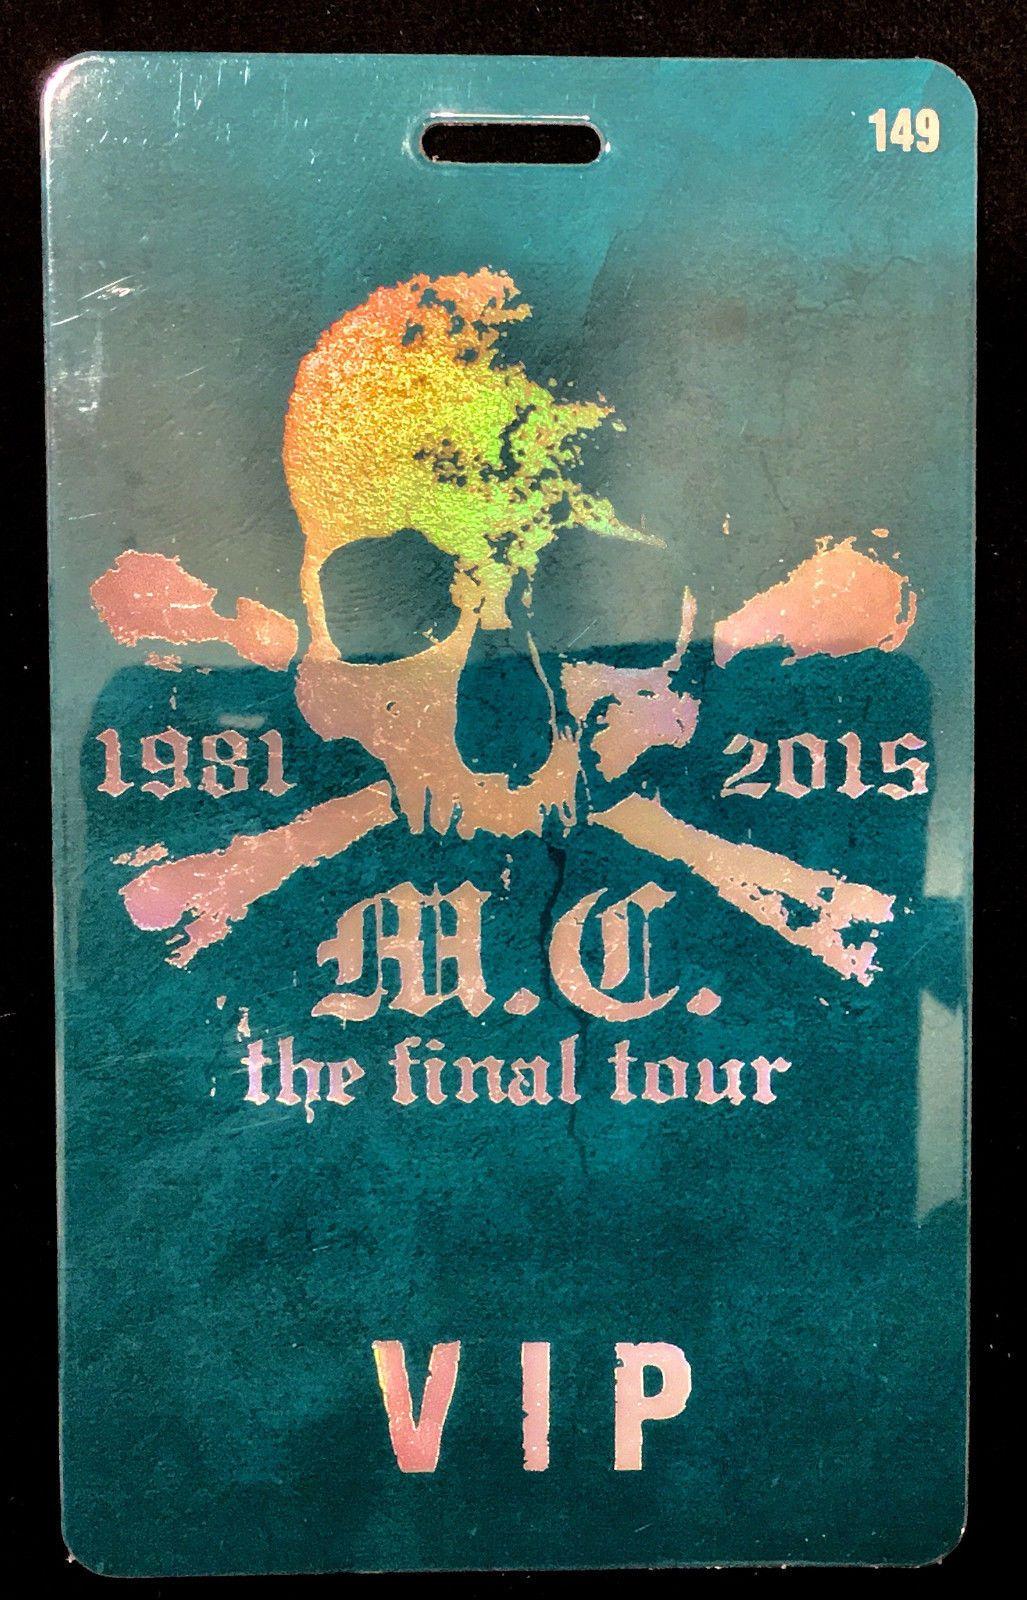 Cool Motley Crue Vip Tour Laminate Backstage Pass Final Tour 2015 Check More At Http Harmonisproduction Com Motley Crue Vip Tour Laminate Bac Motley Crue